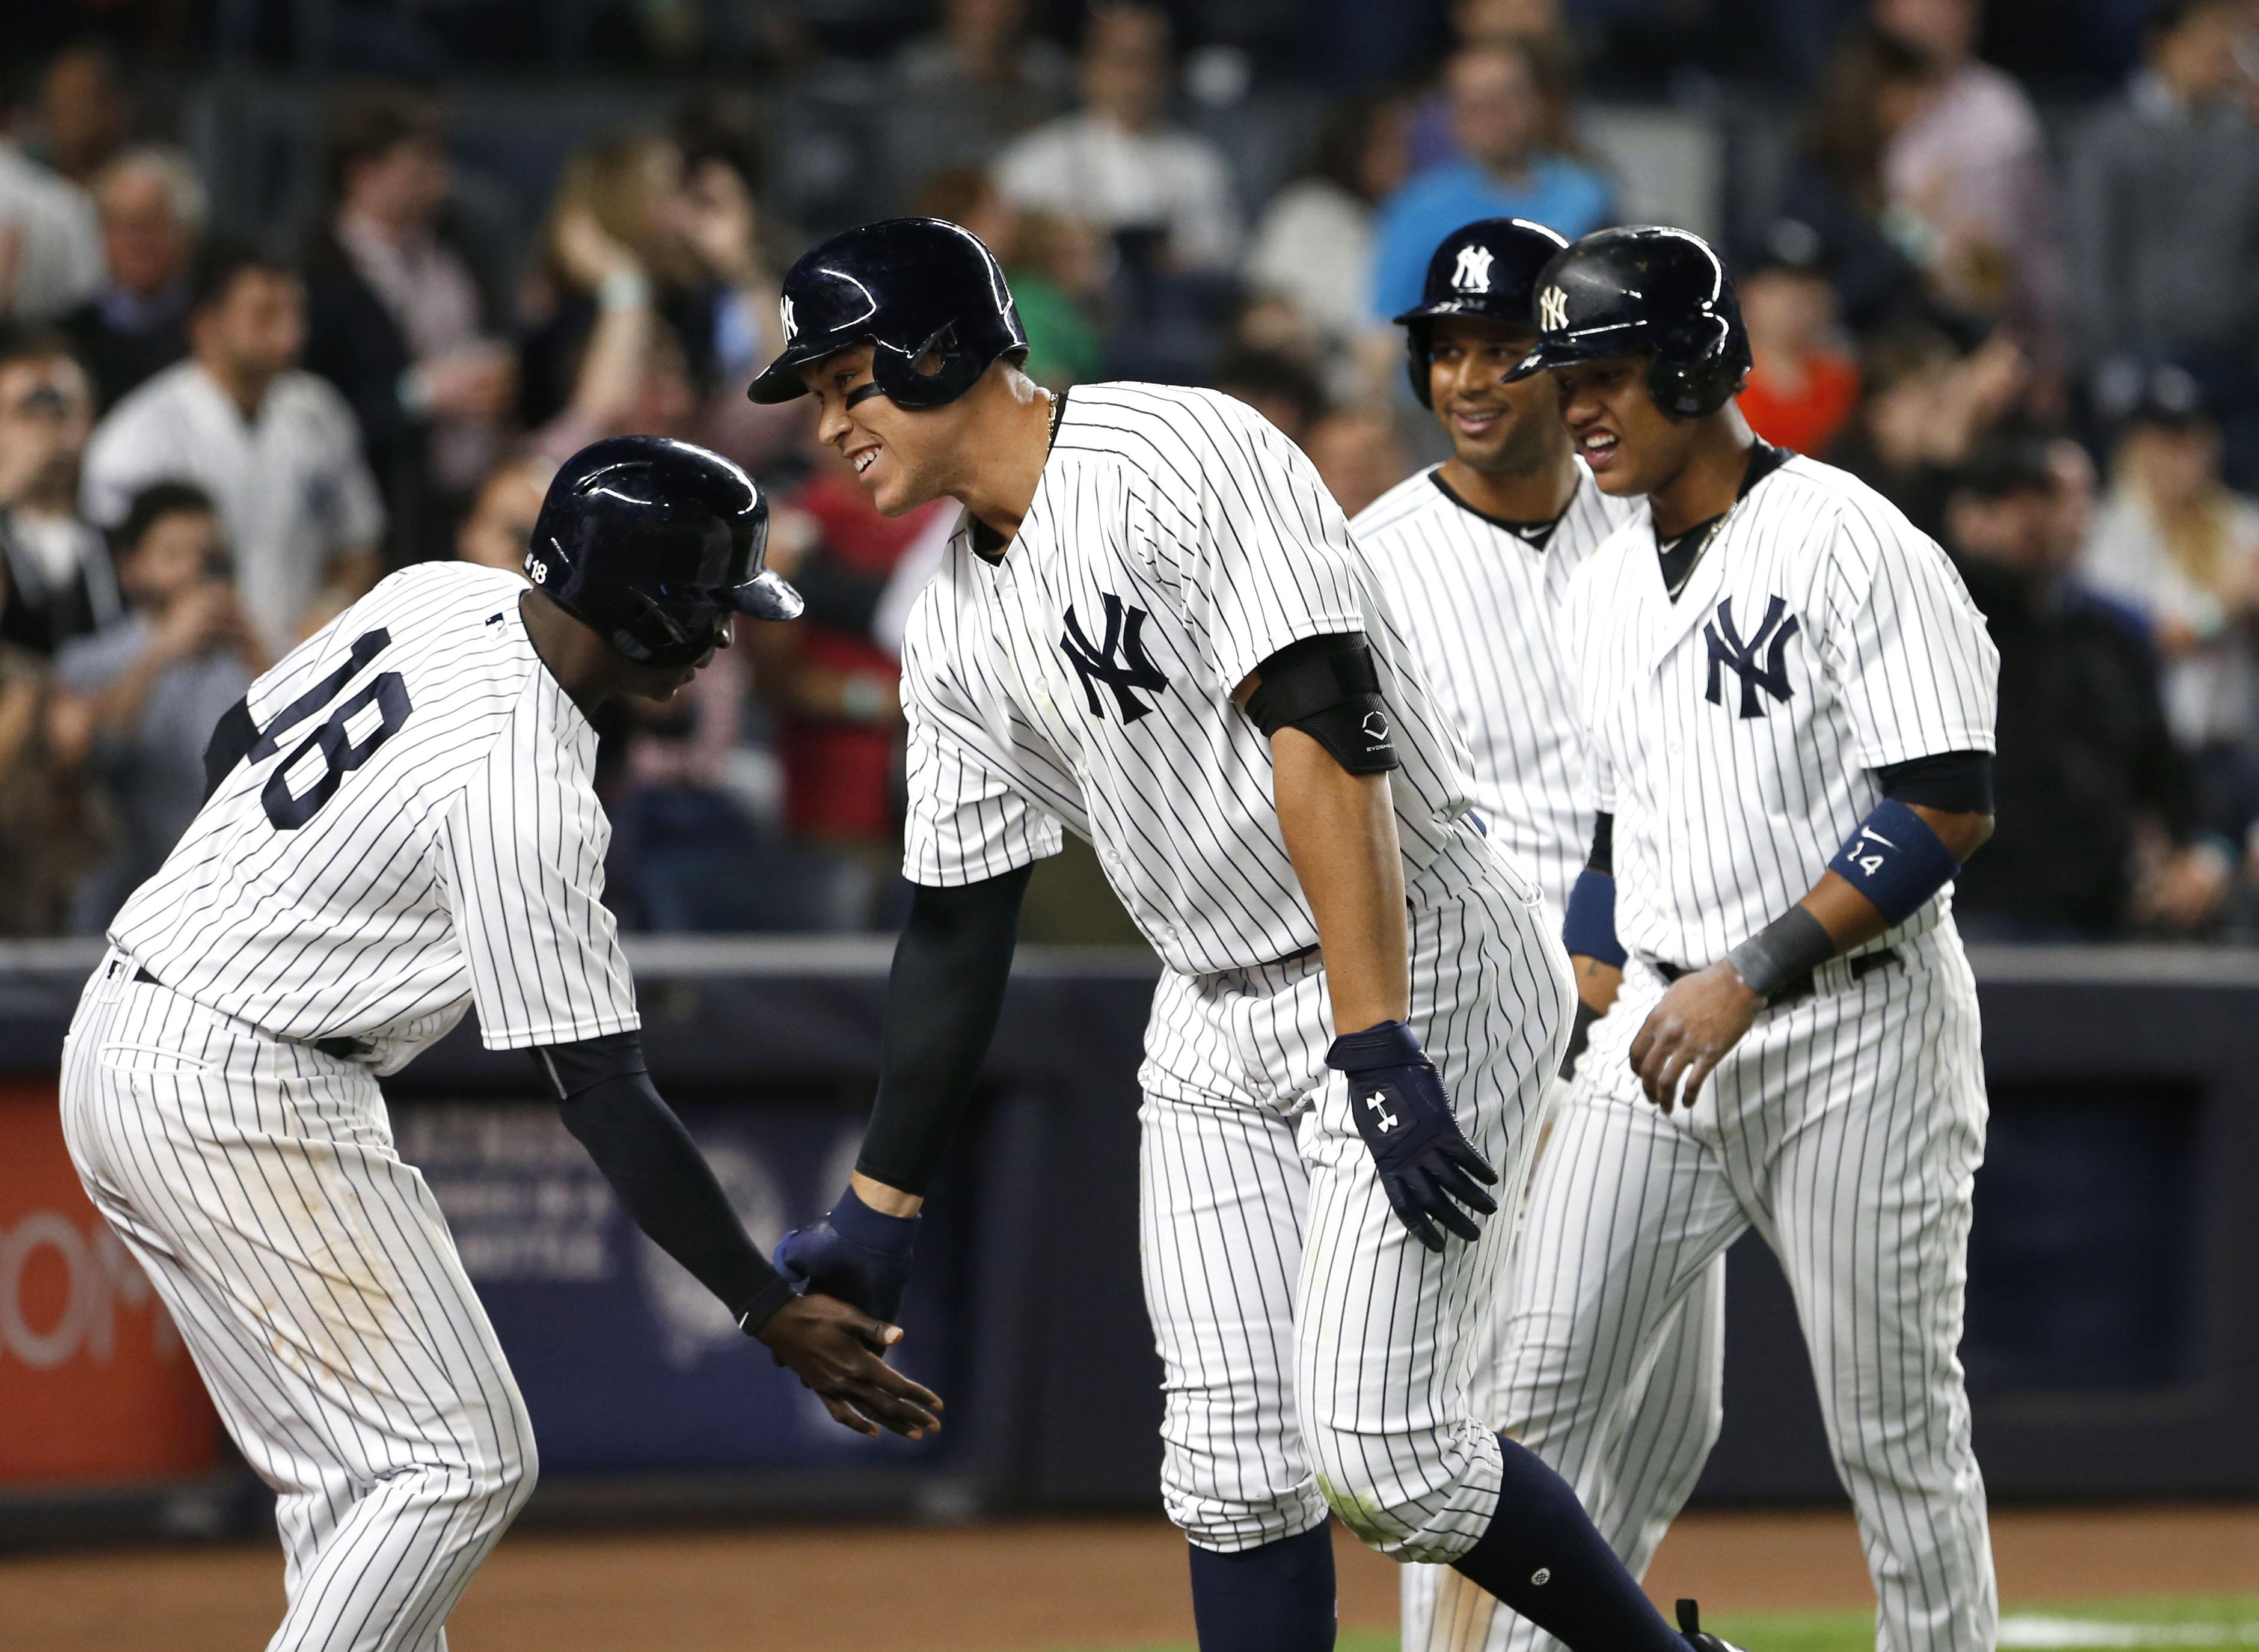 Image Result For Washington Nationals Vs New York Yankees